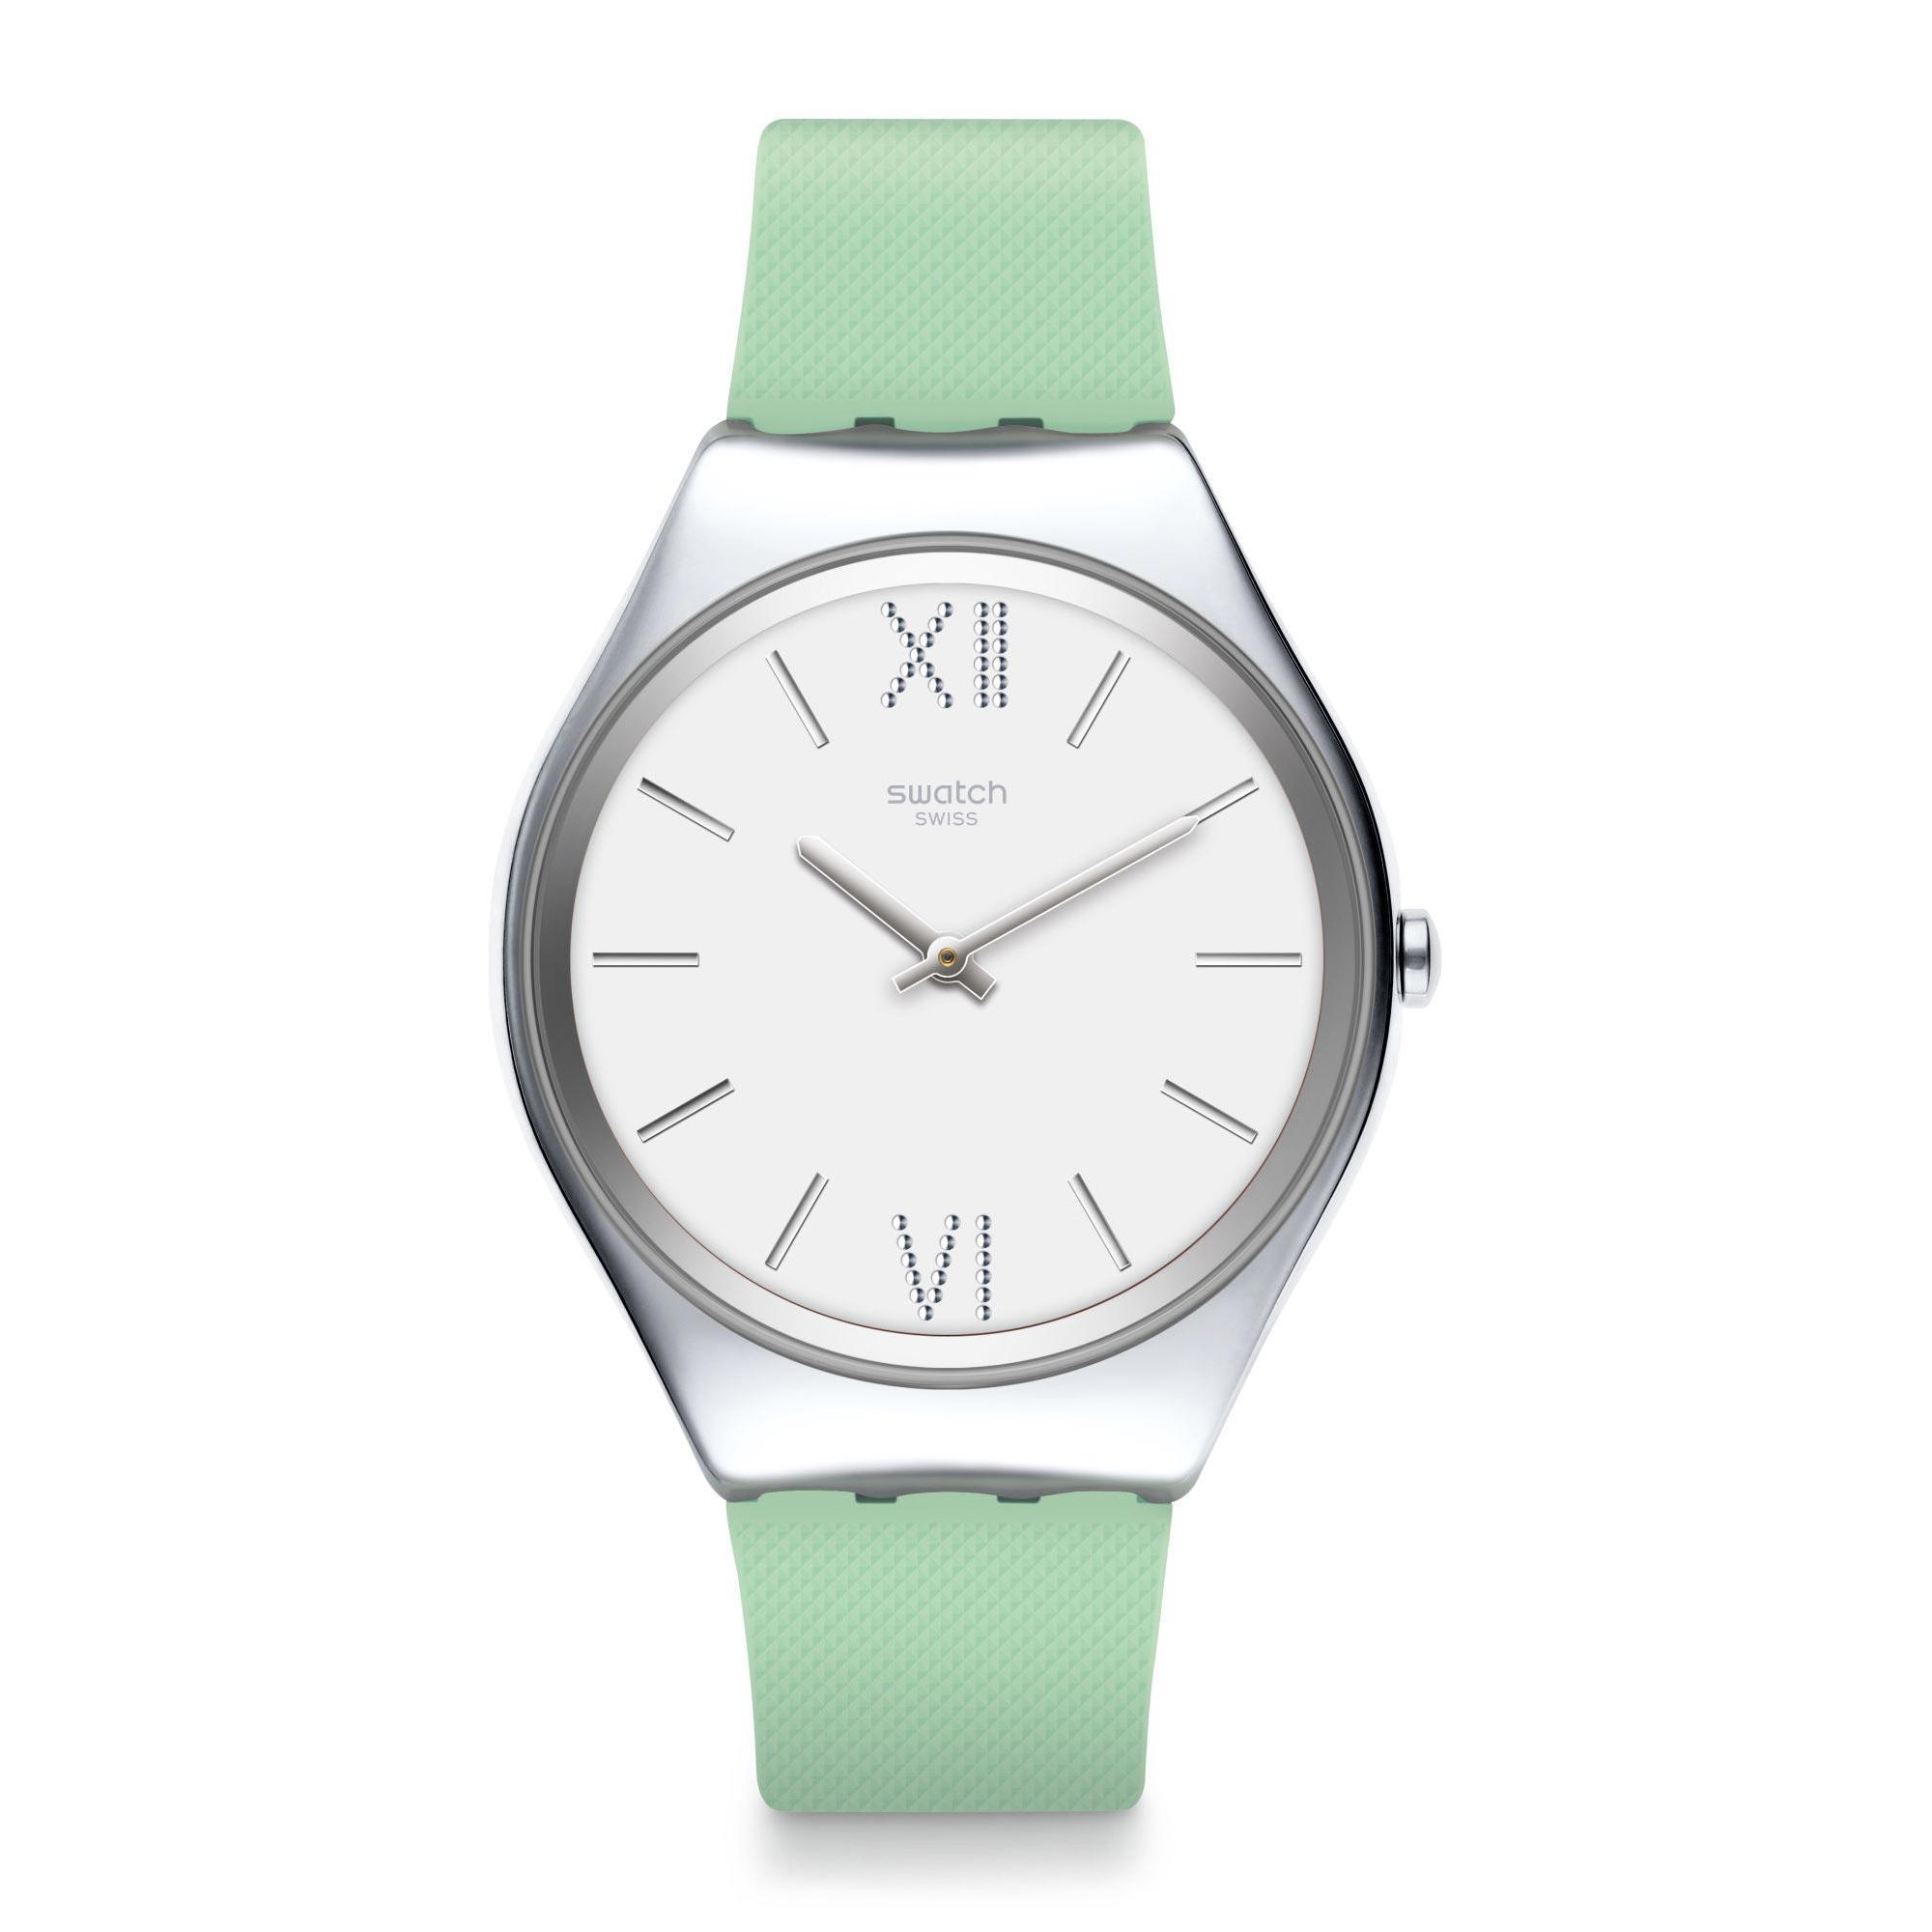 Swatch Skin Aloe Quartz White Dial Green Silicone Strap Ladies Watch SYXS125 RRP £124